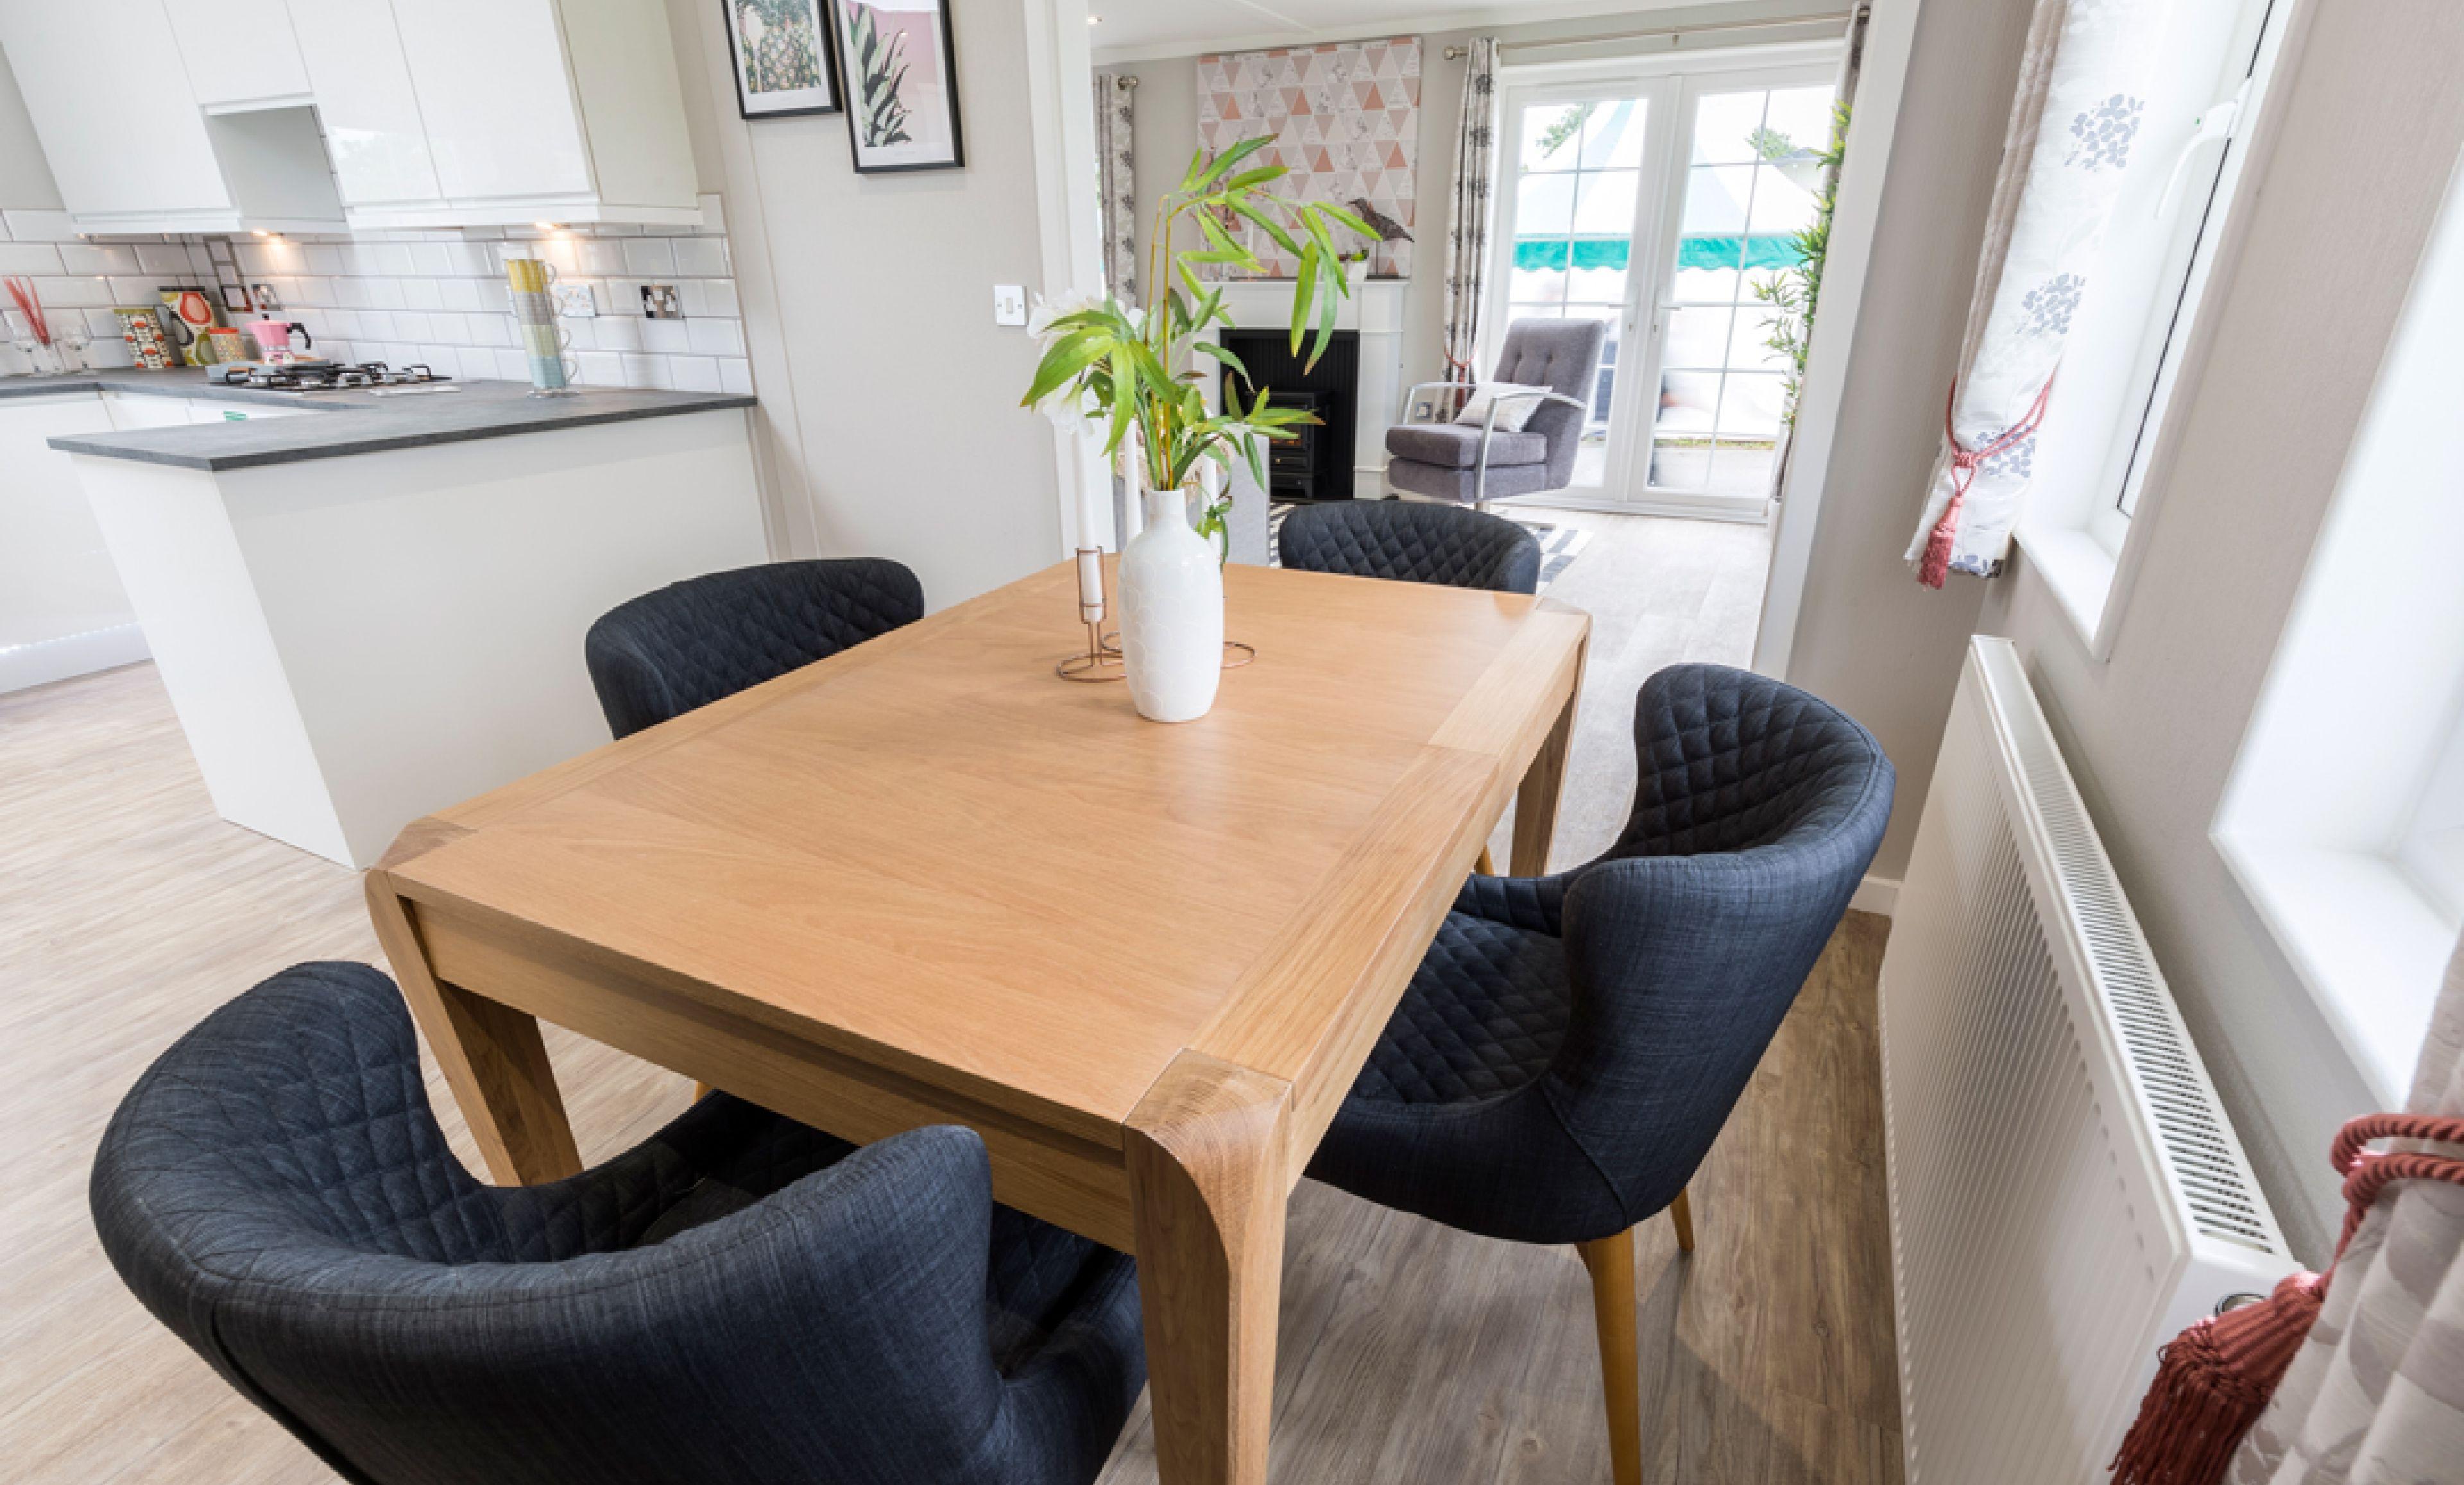 The Kensington dining room